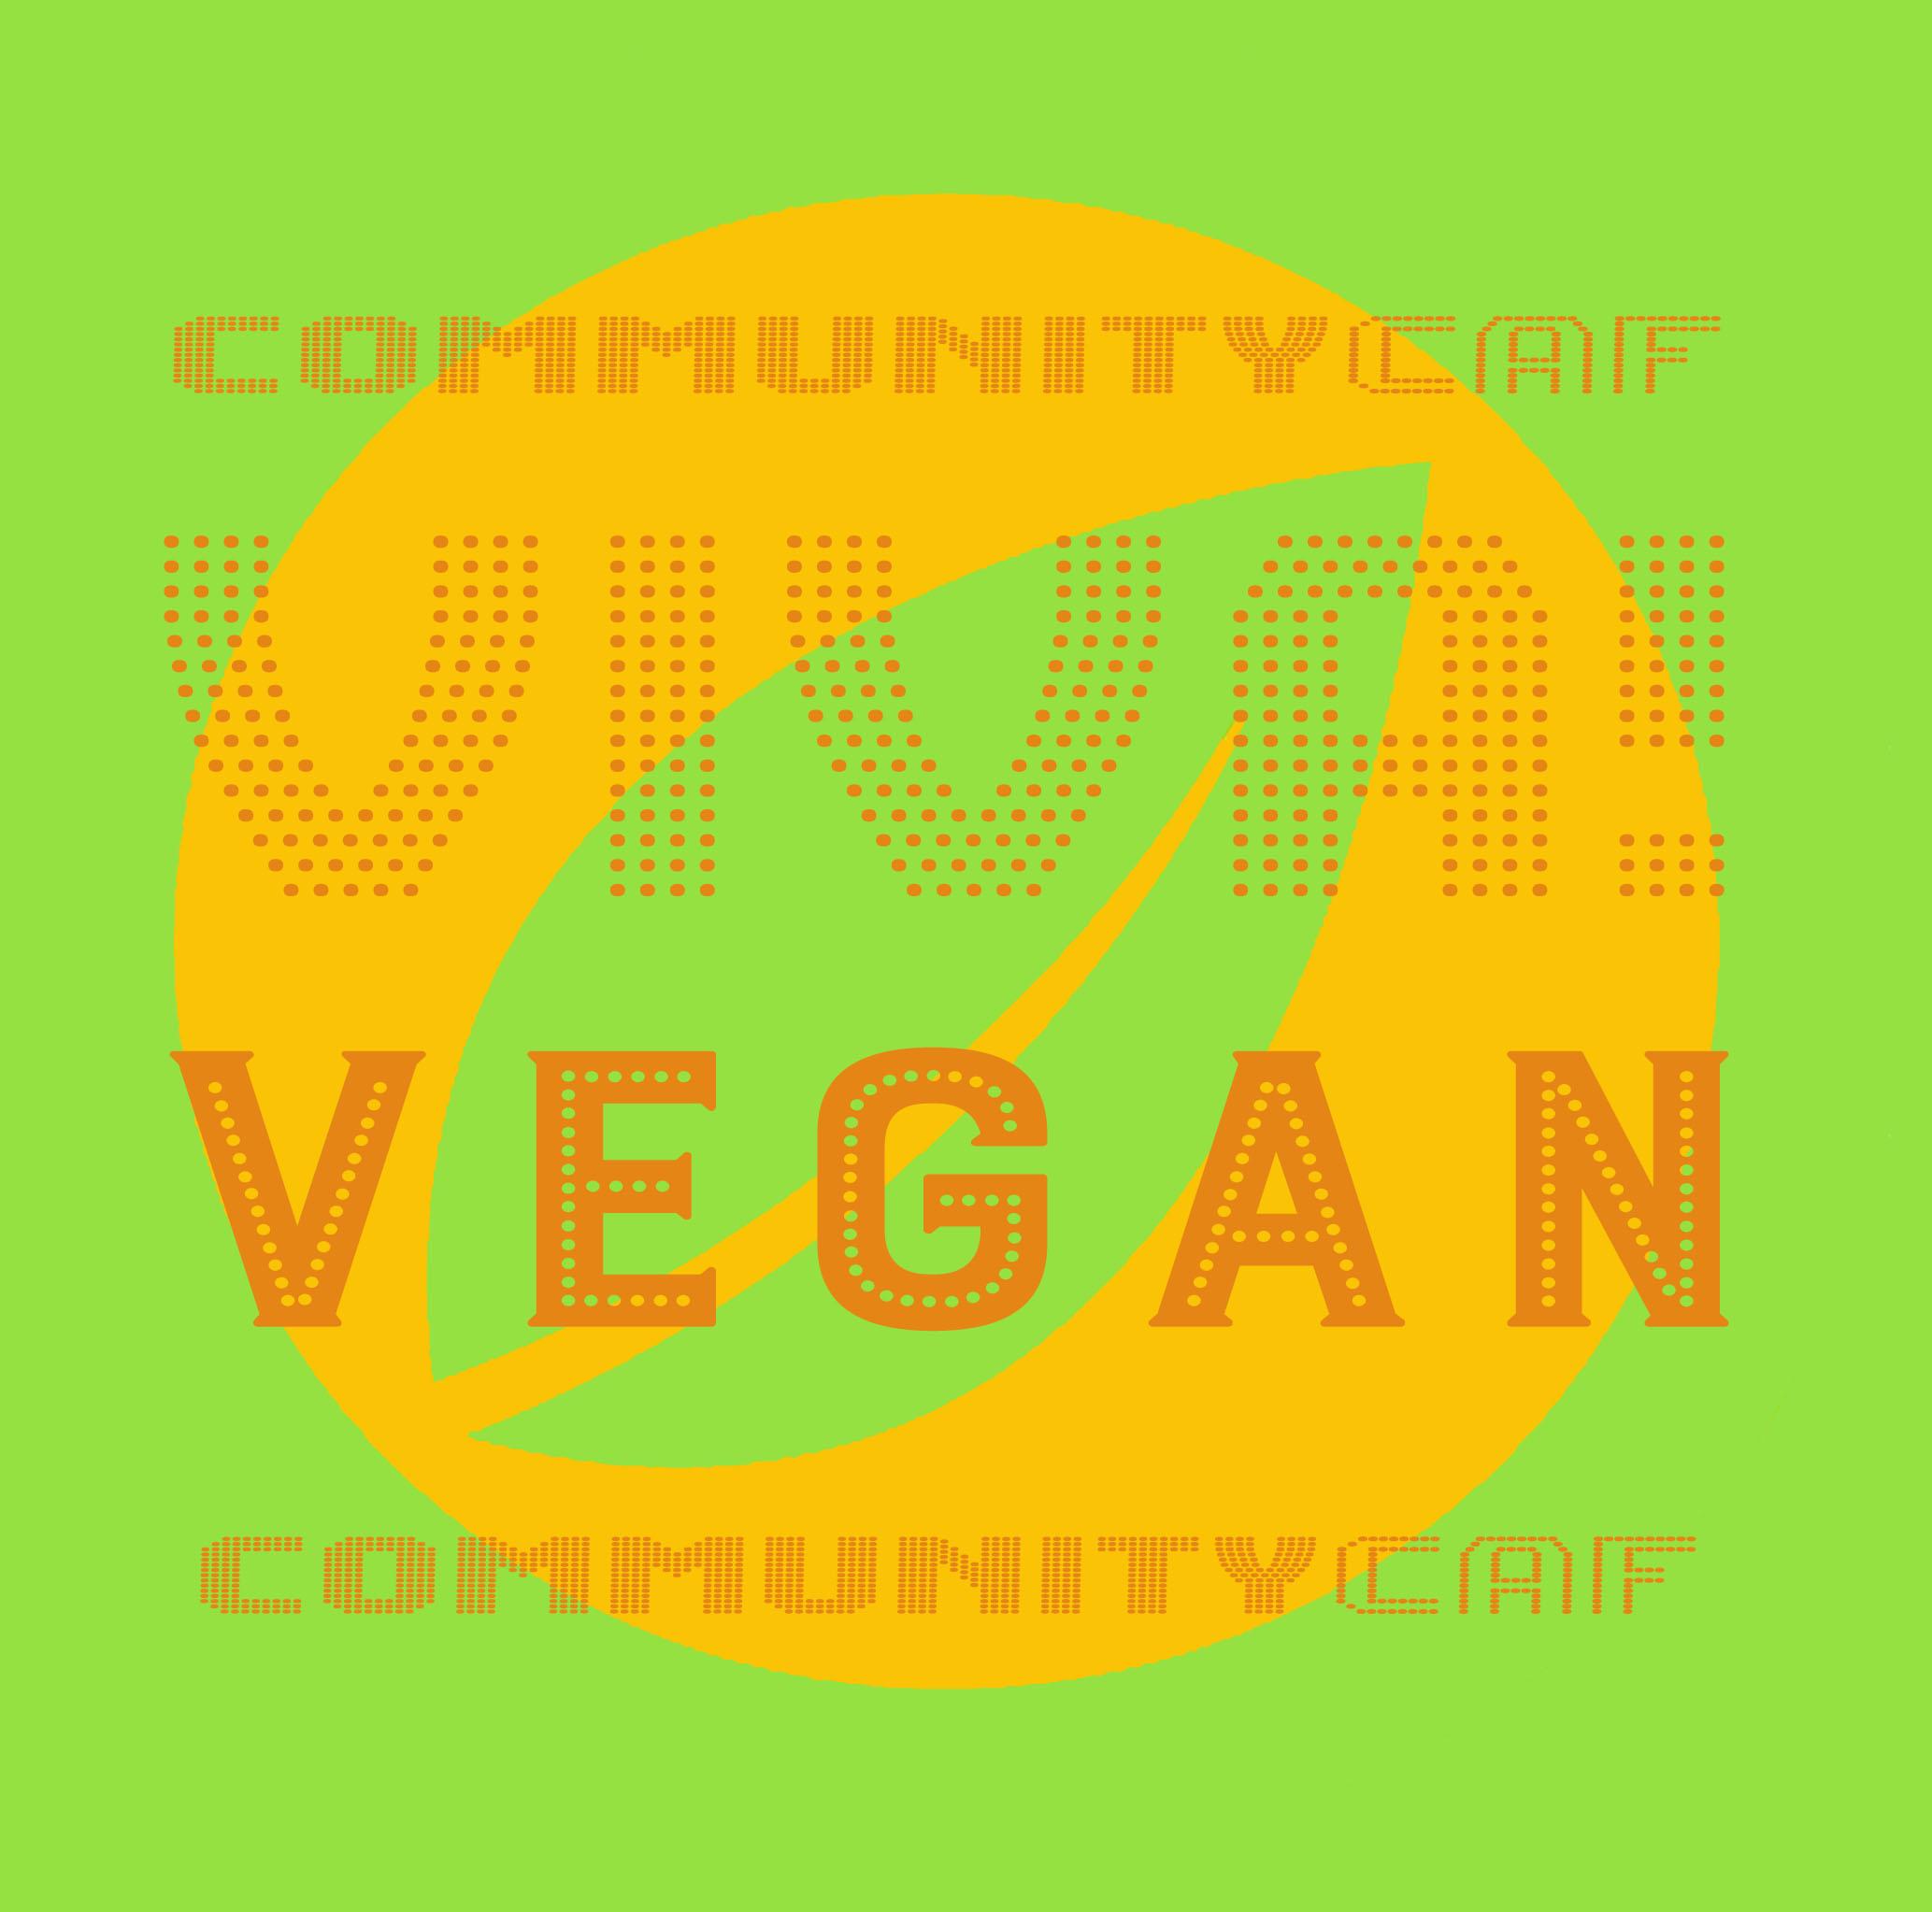 Viva! Vegan